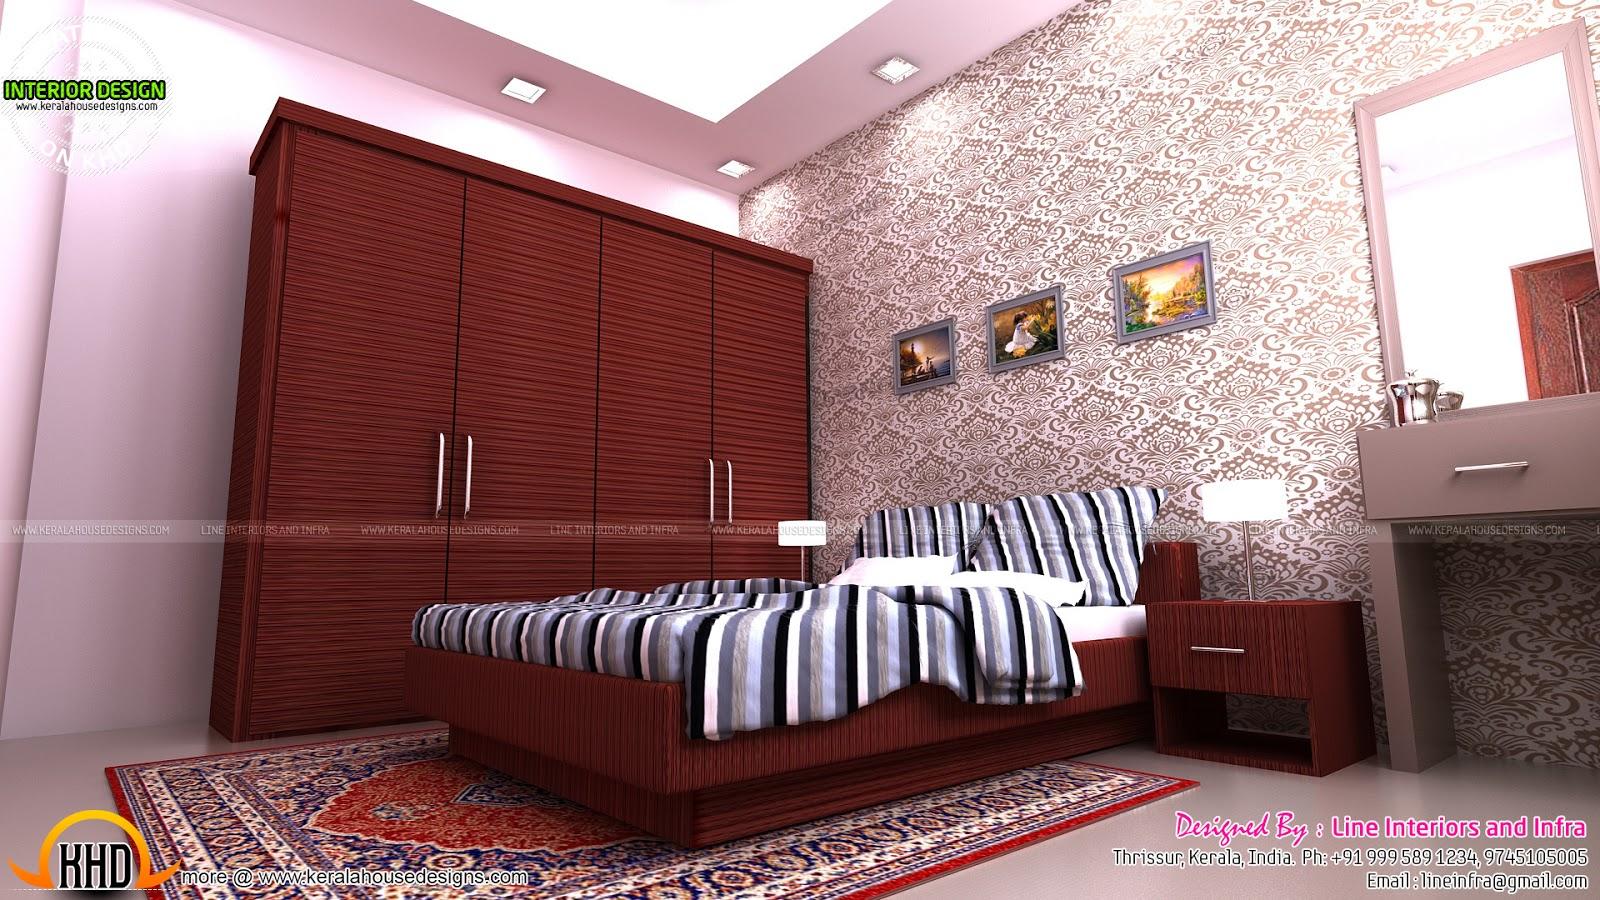 Modular Kitchen Bedroom Dining Interiors In Kerala